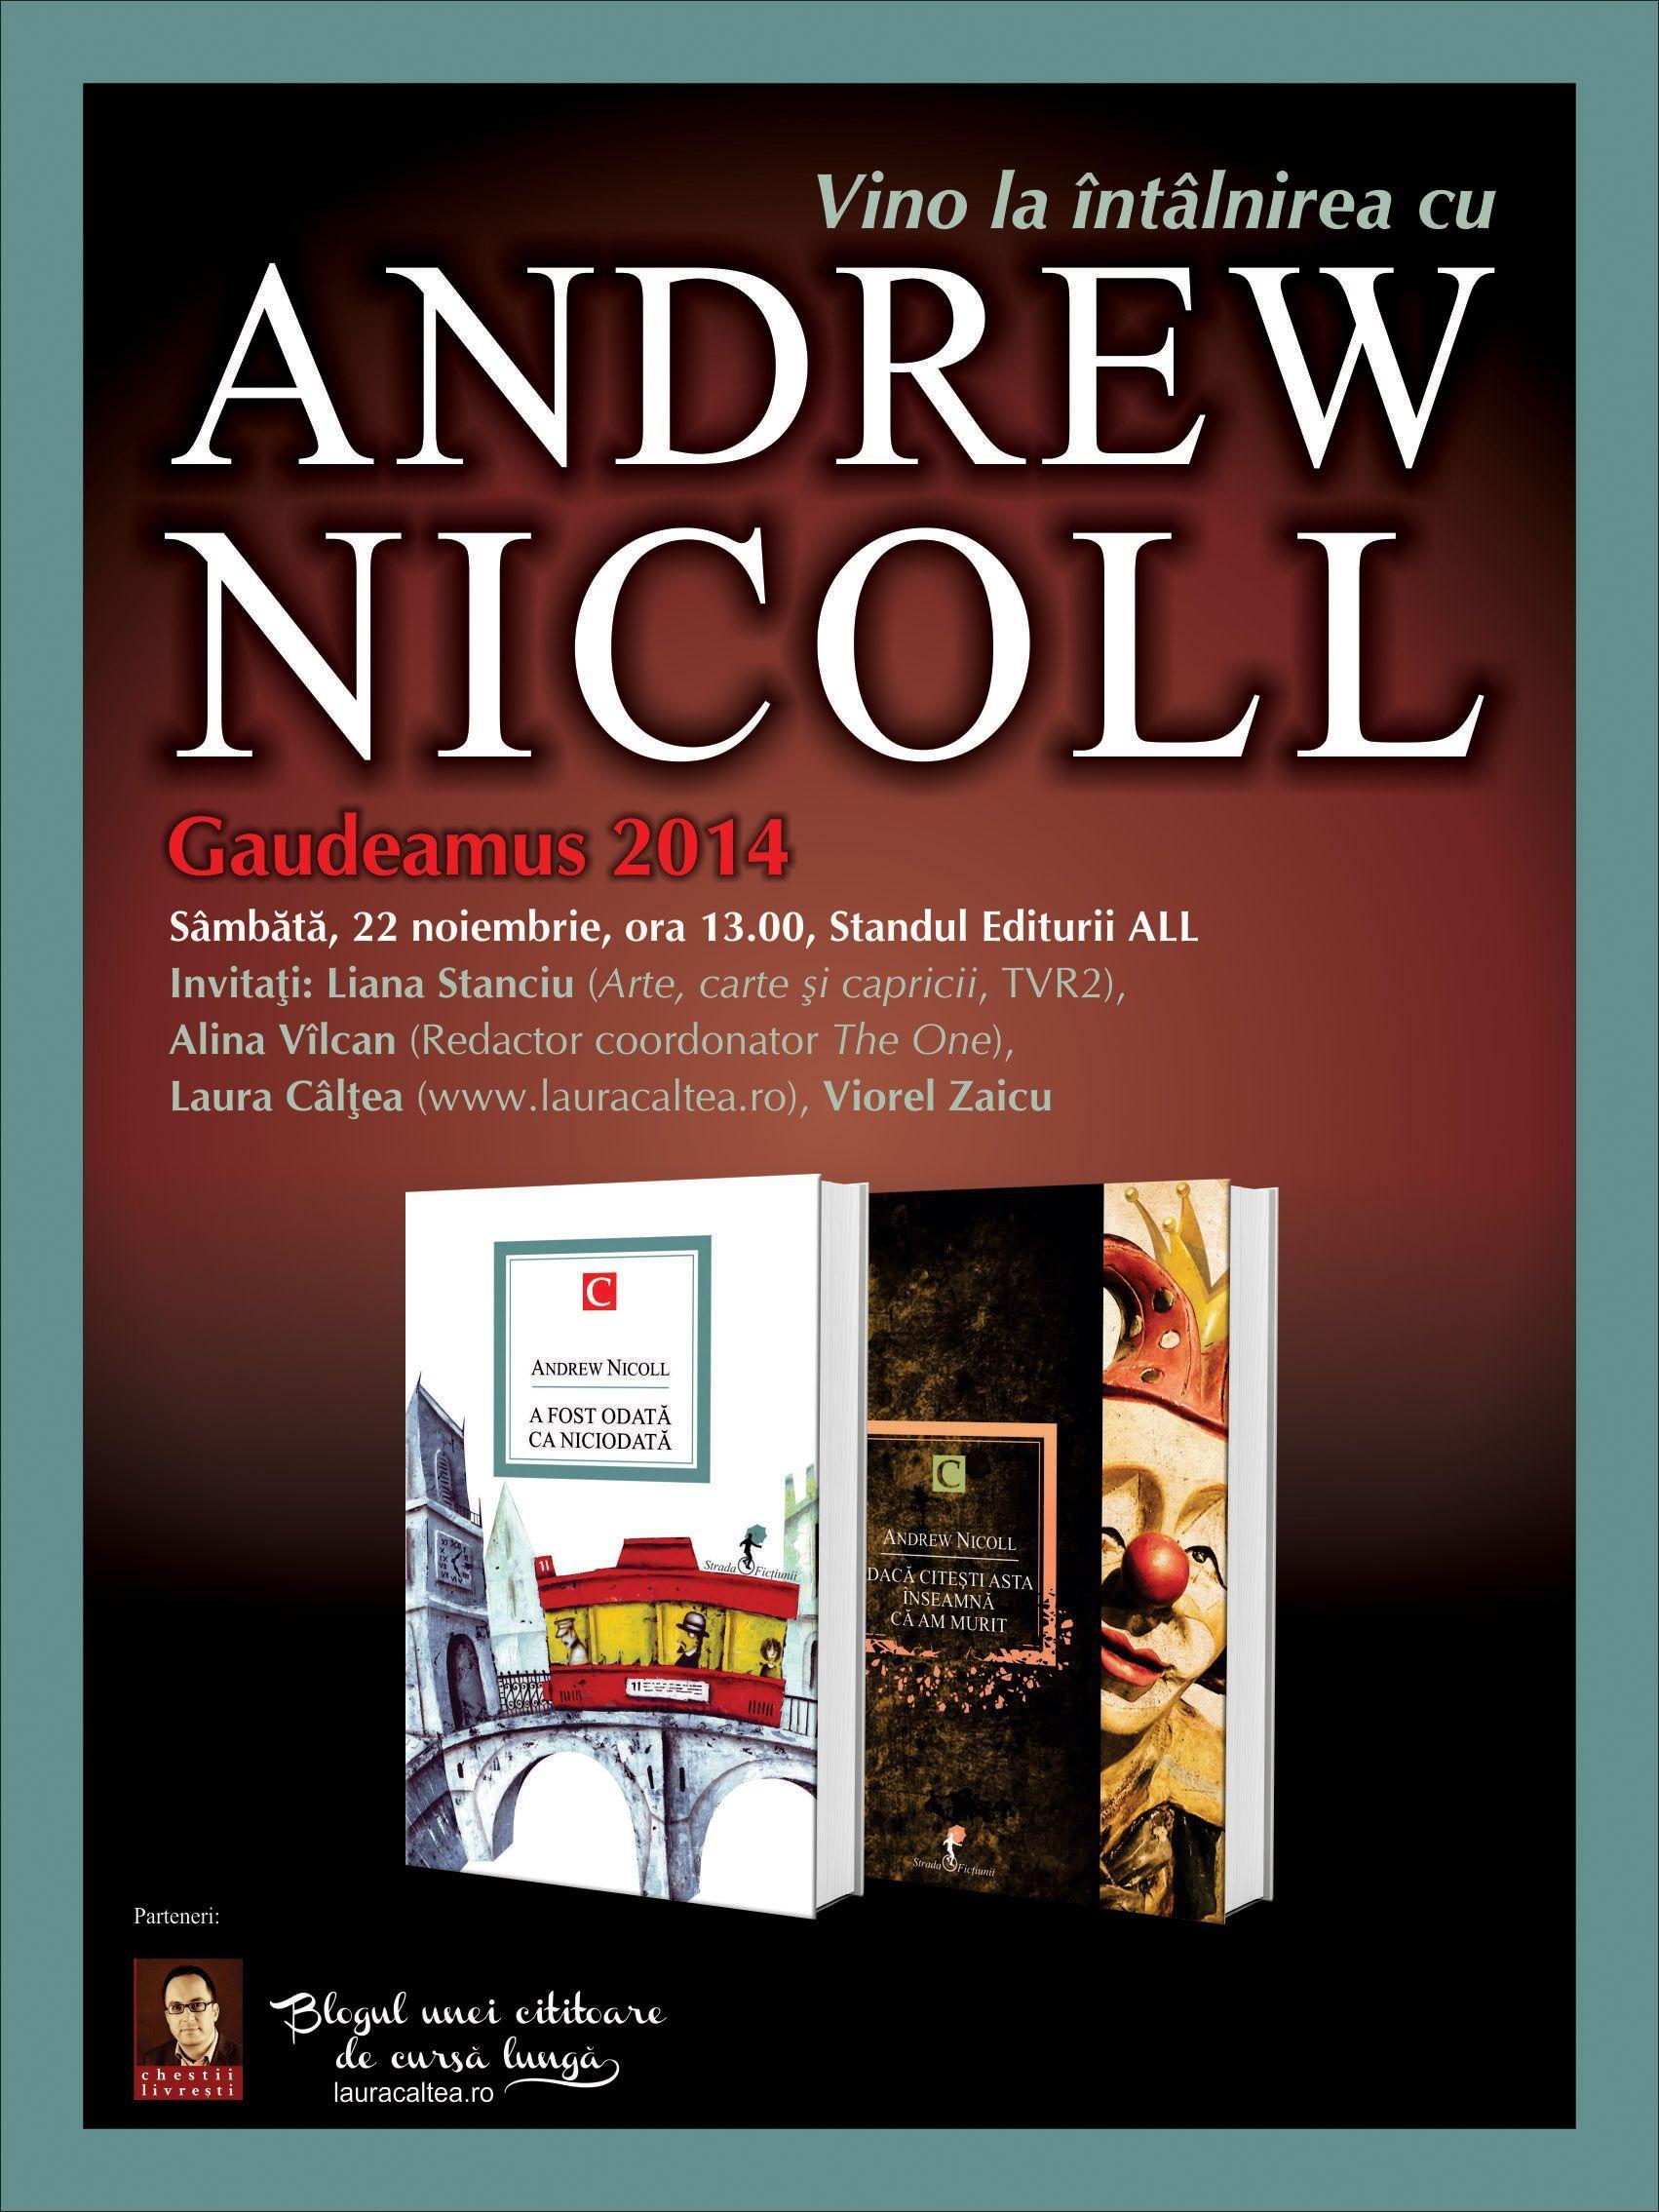 Andrew Nicoll vine în România la invitația Editurilor ALL